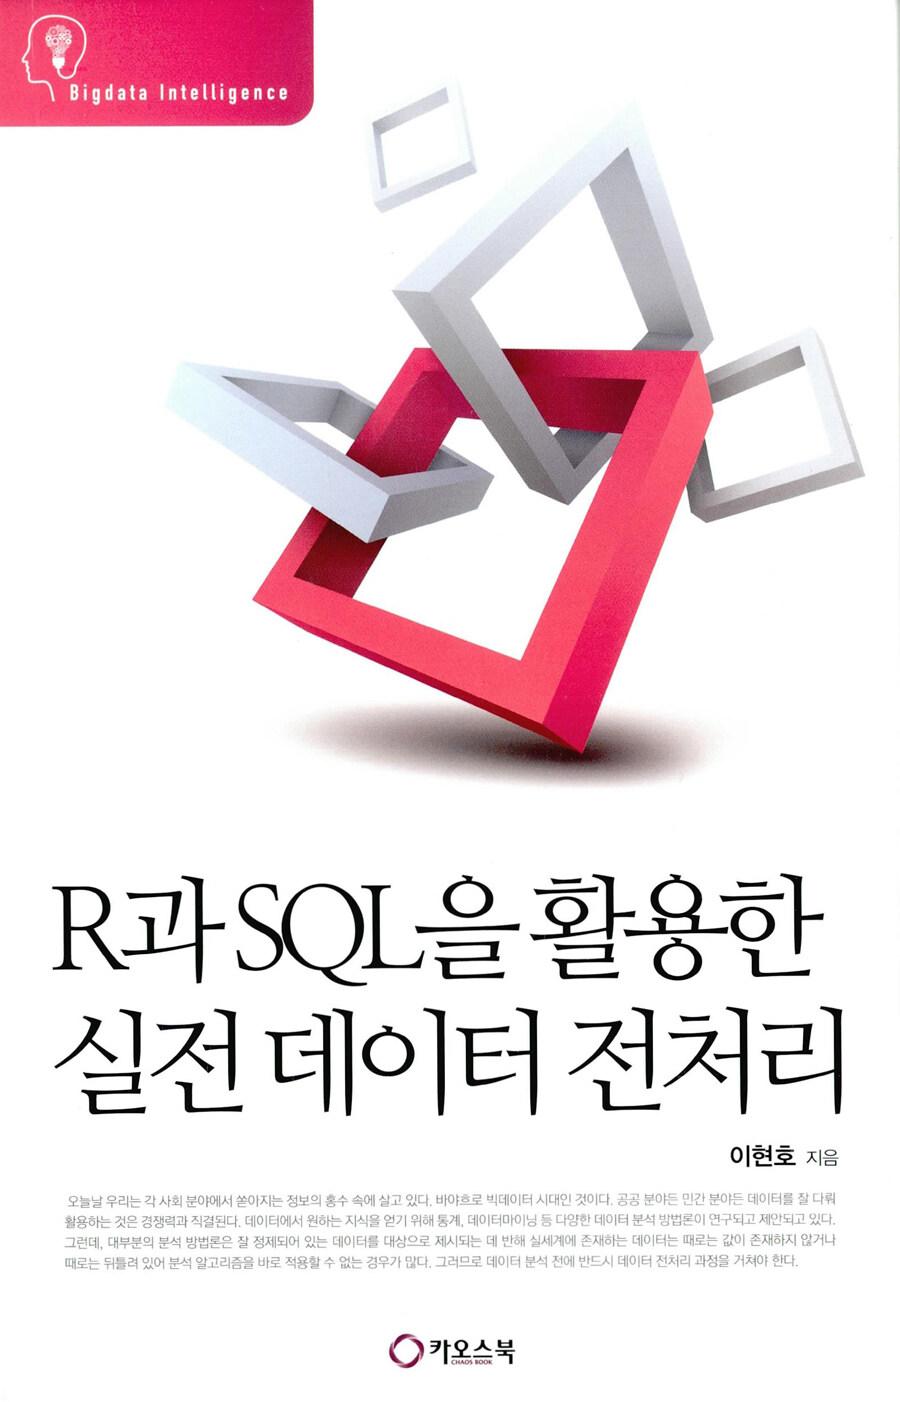 R과 SQL을 활용한 실전데이터 전처리